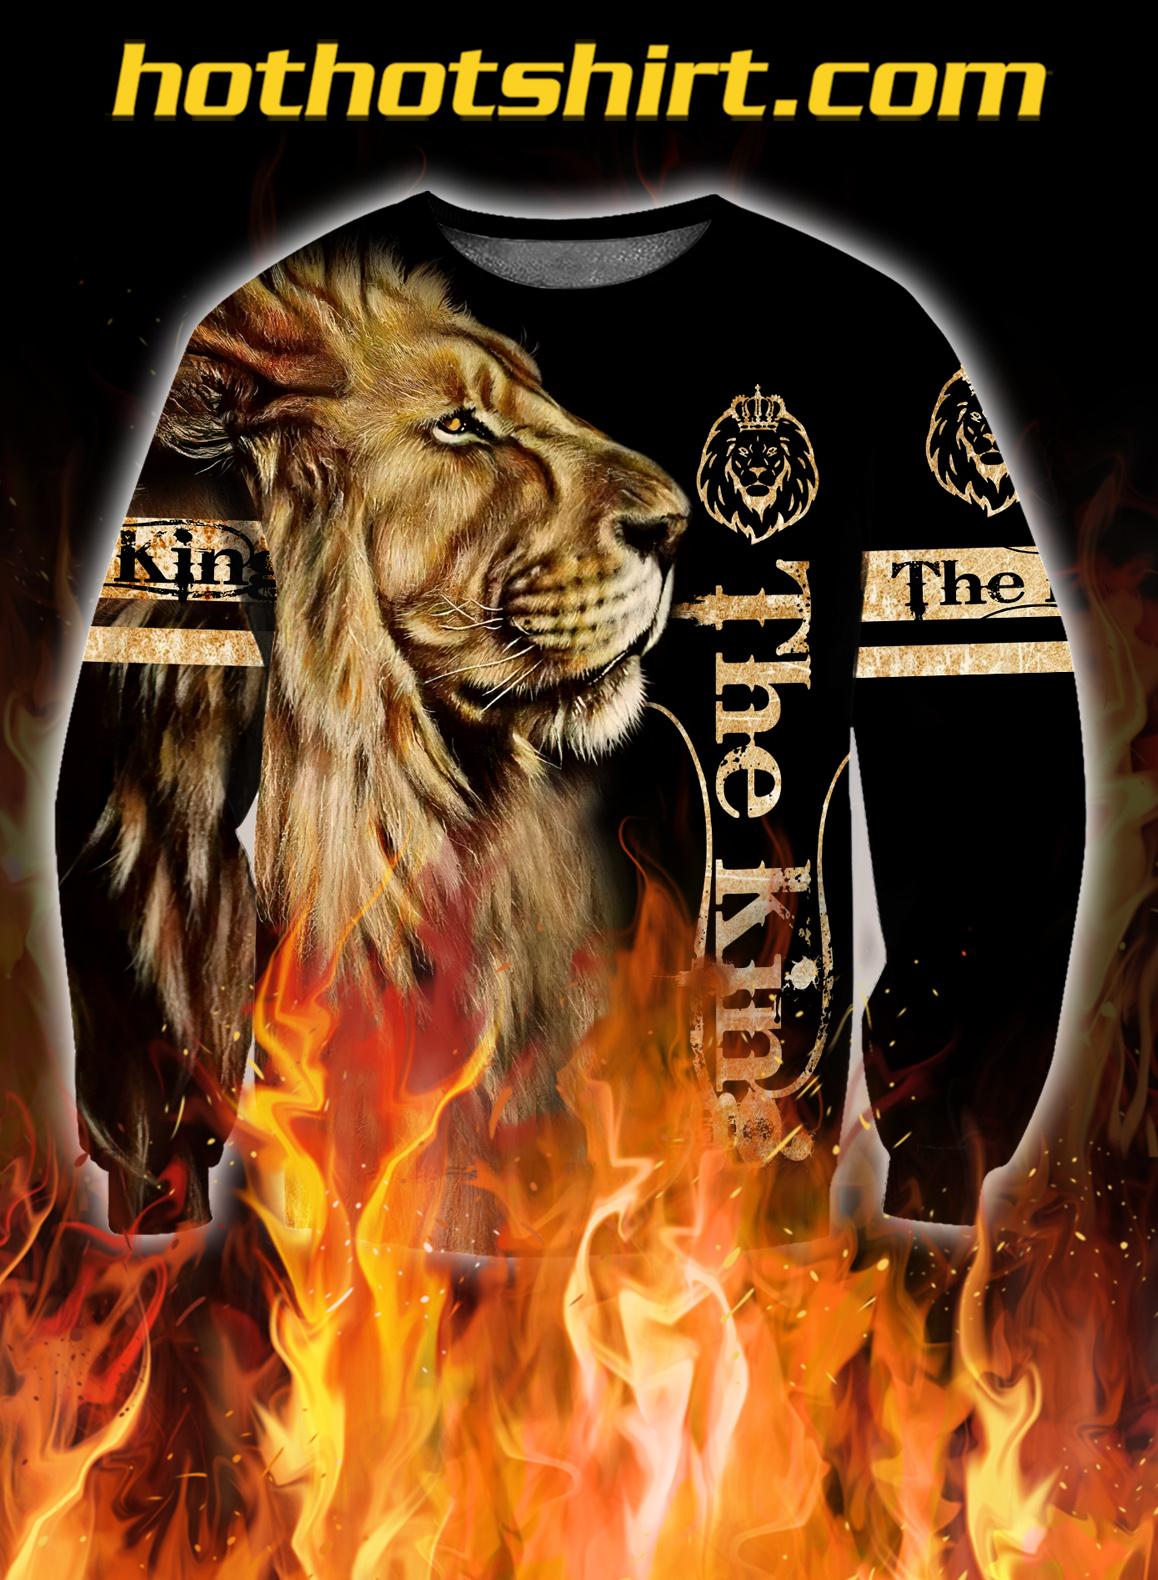 King lion 3d all over printed unisex sweatshirt